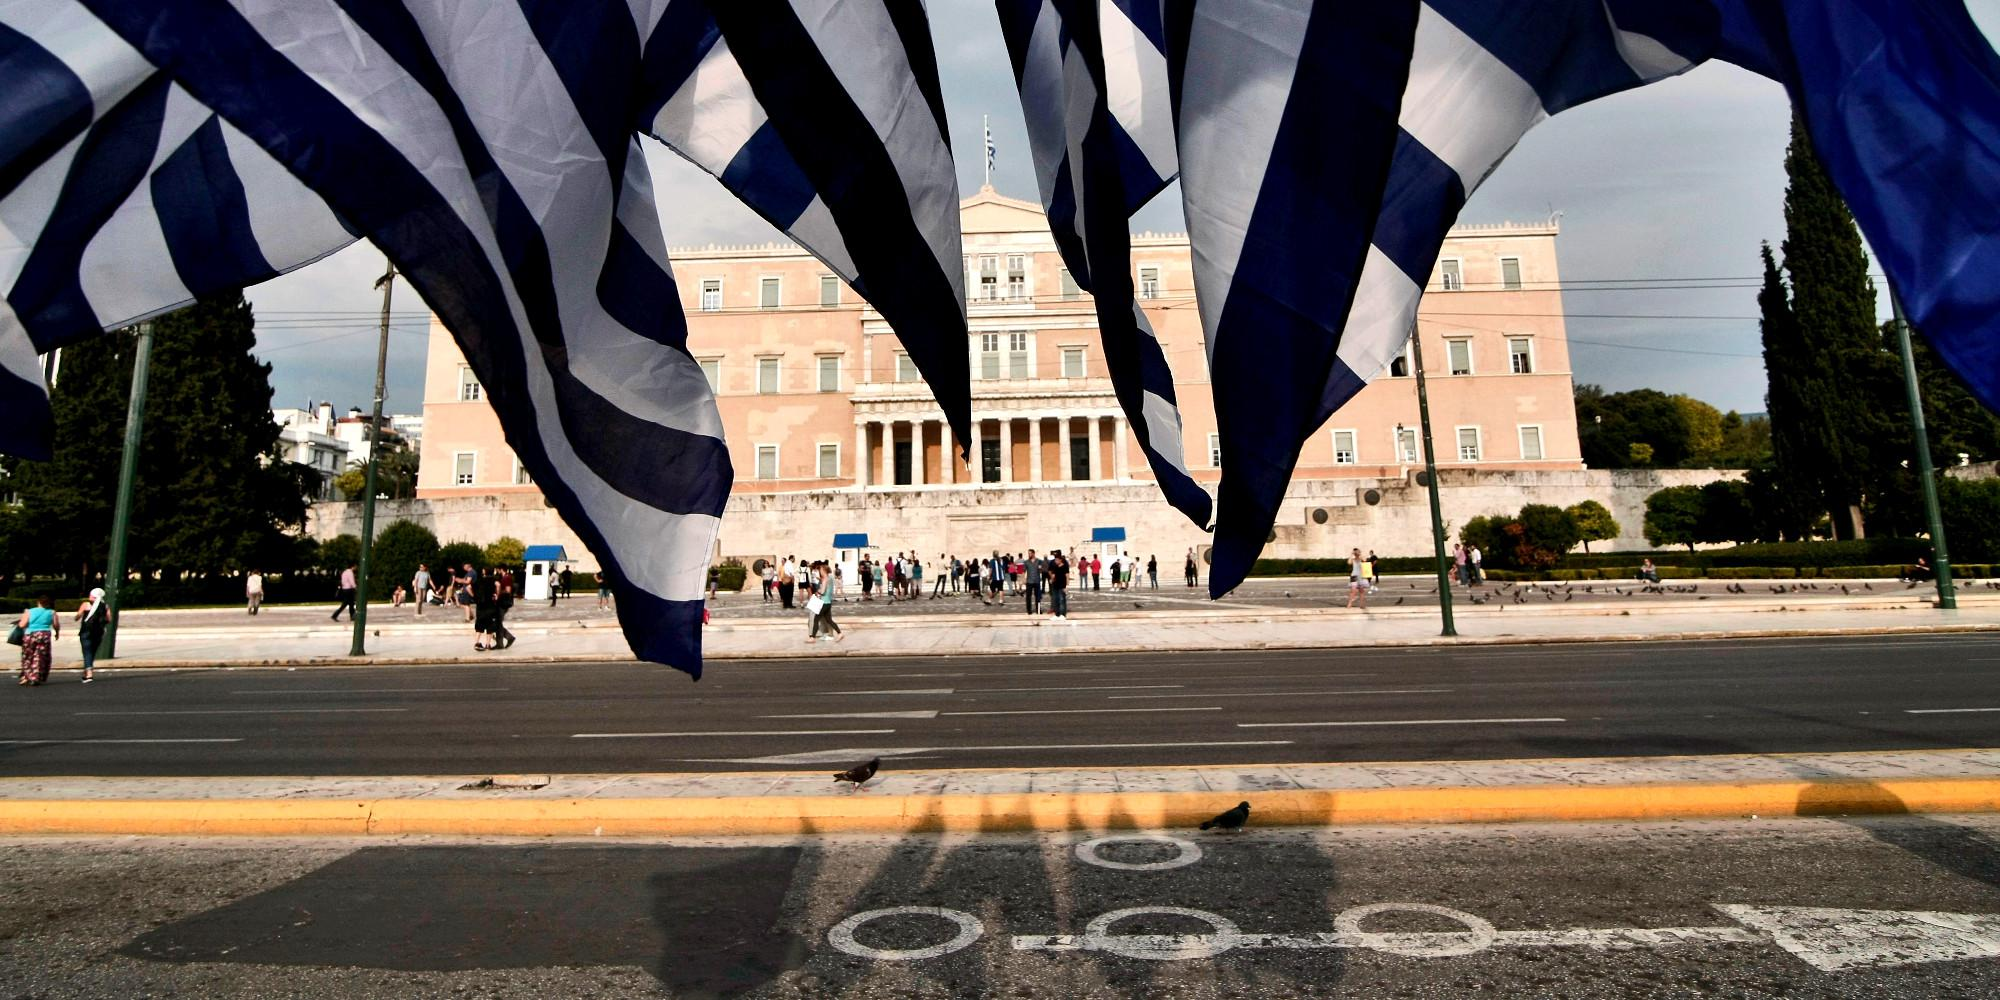 public-issue-dimoskopisi-1000 Αξιολόγηση-θρίλερ με προληπτικά μέτρα και υποψία αδιεξόδου στο Eurogroup